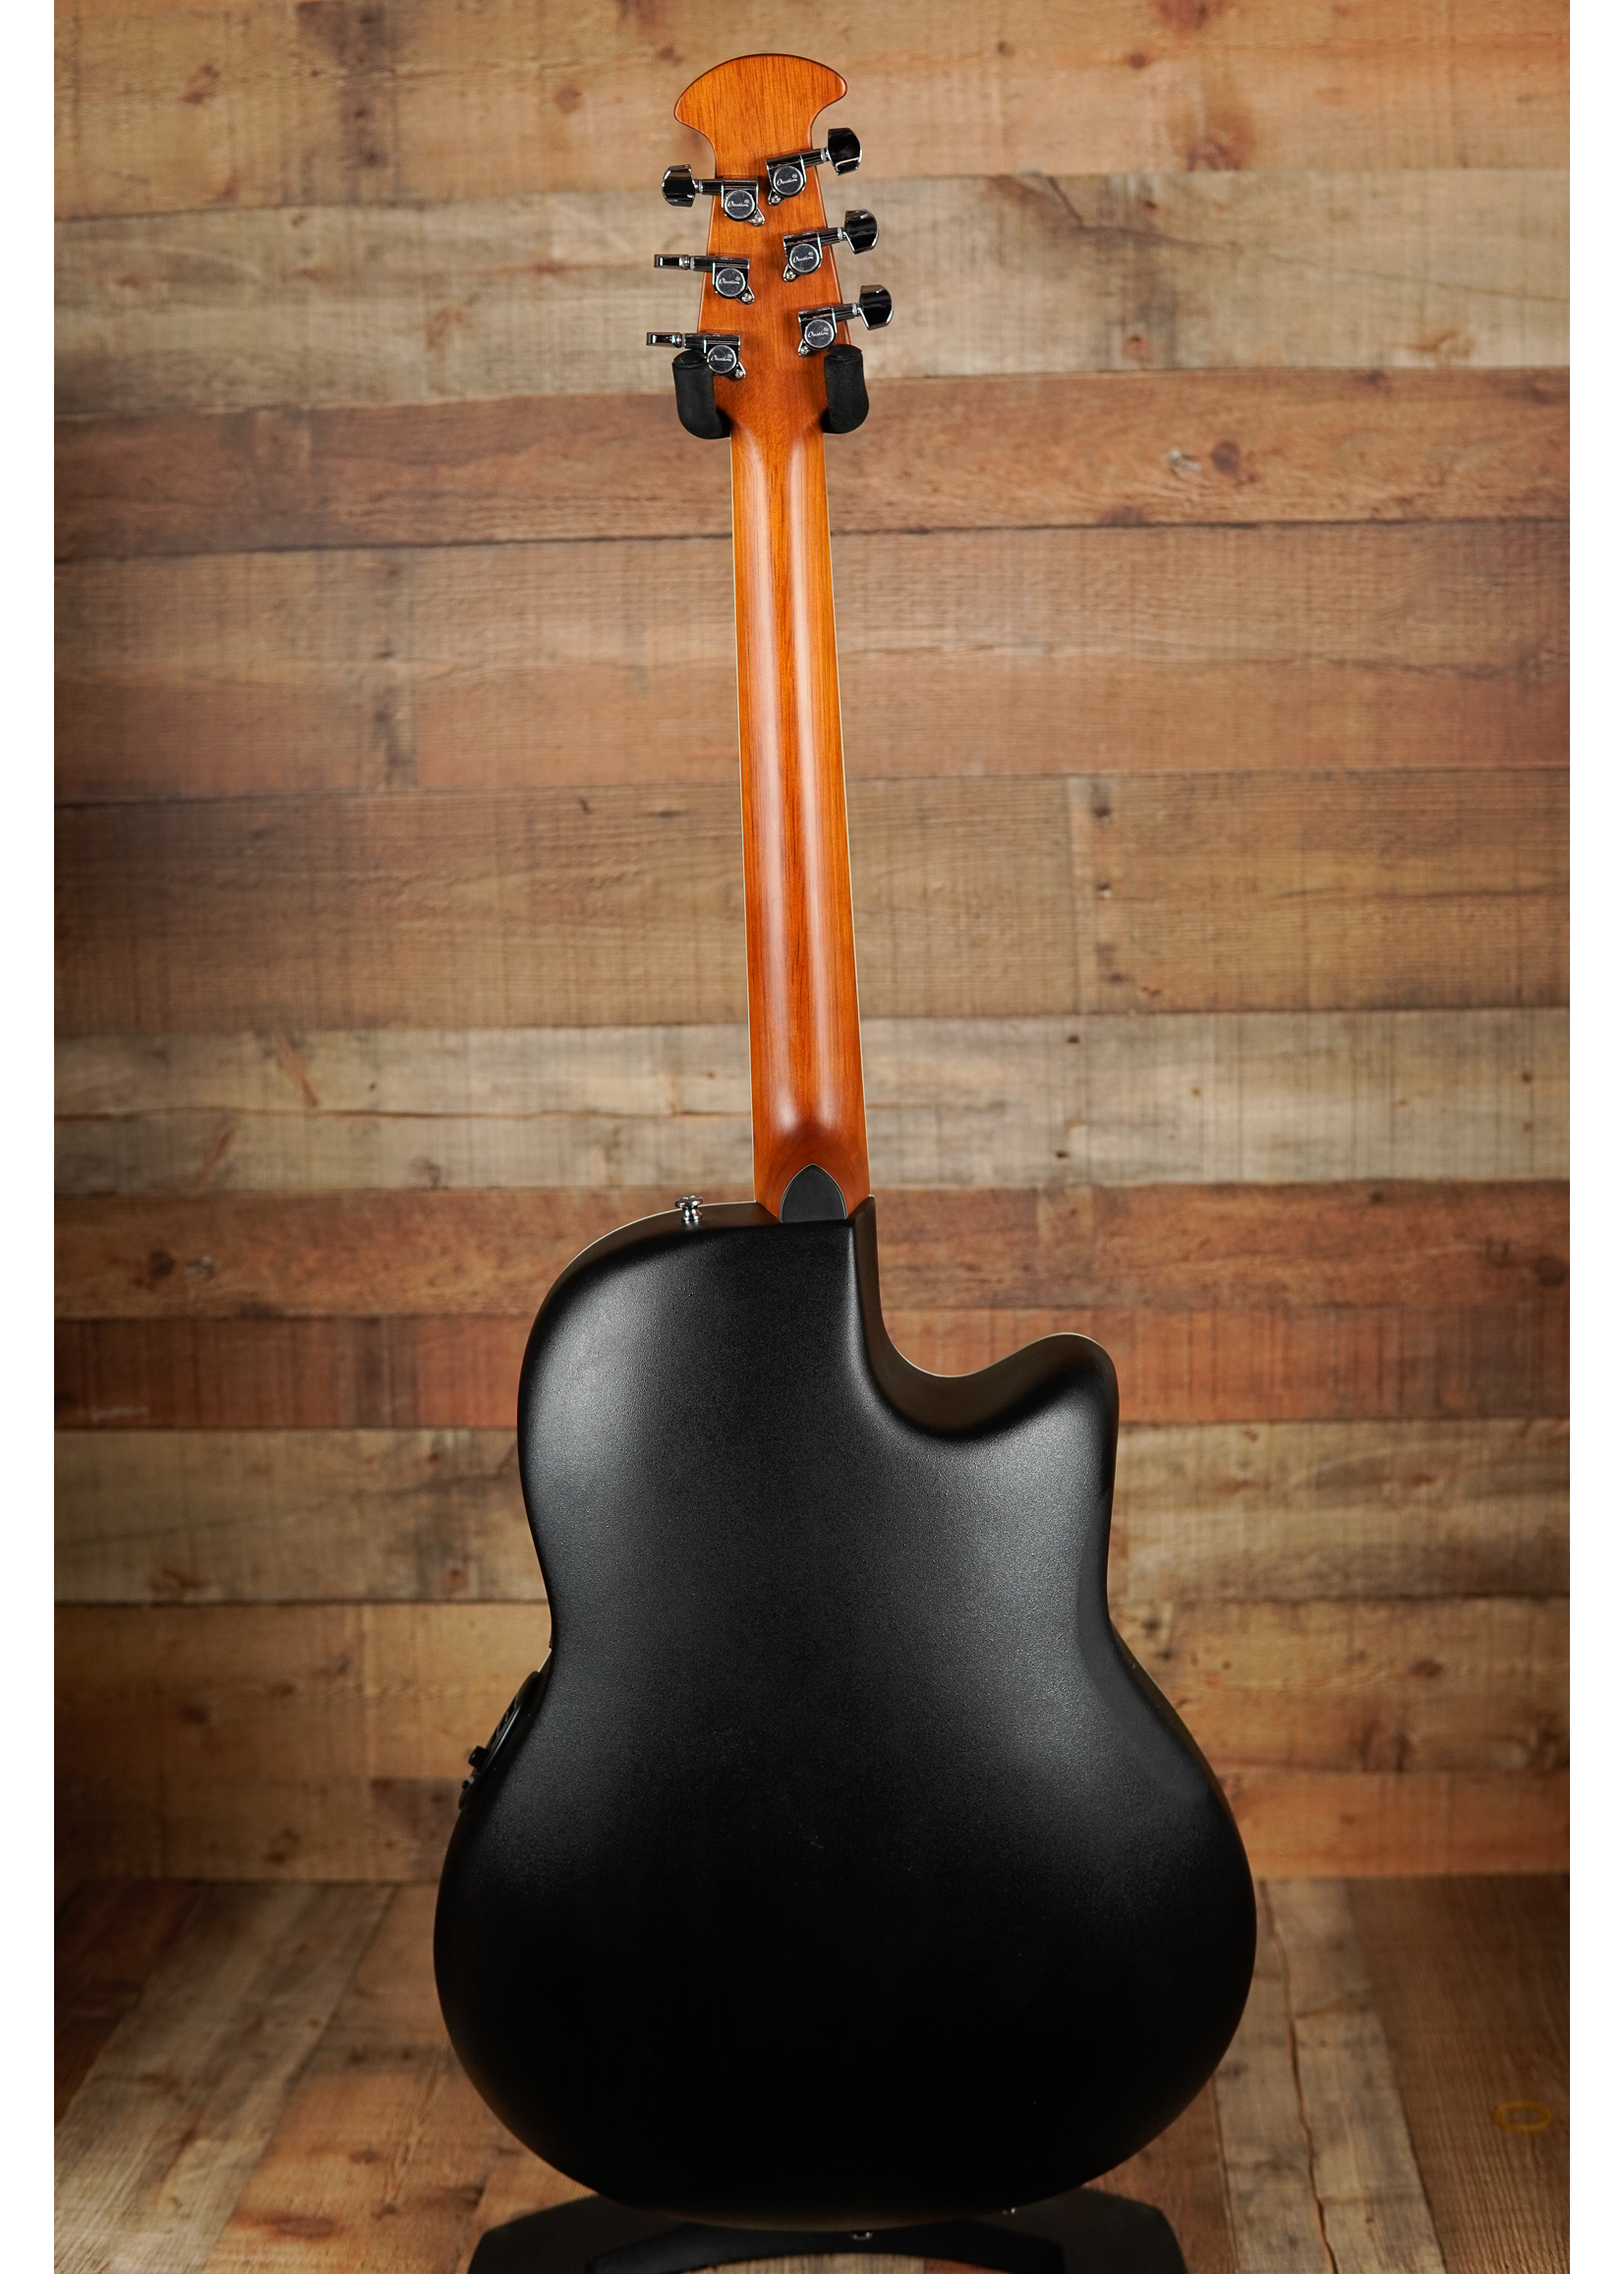 Ovation Ovation Celebrity Standard E-Acoustic Guitar CS24L-4, CS/Cutaway, Natural, Lefty. Mid-Depth